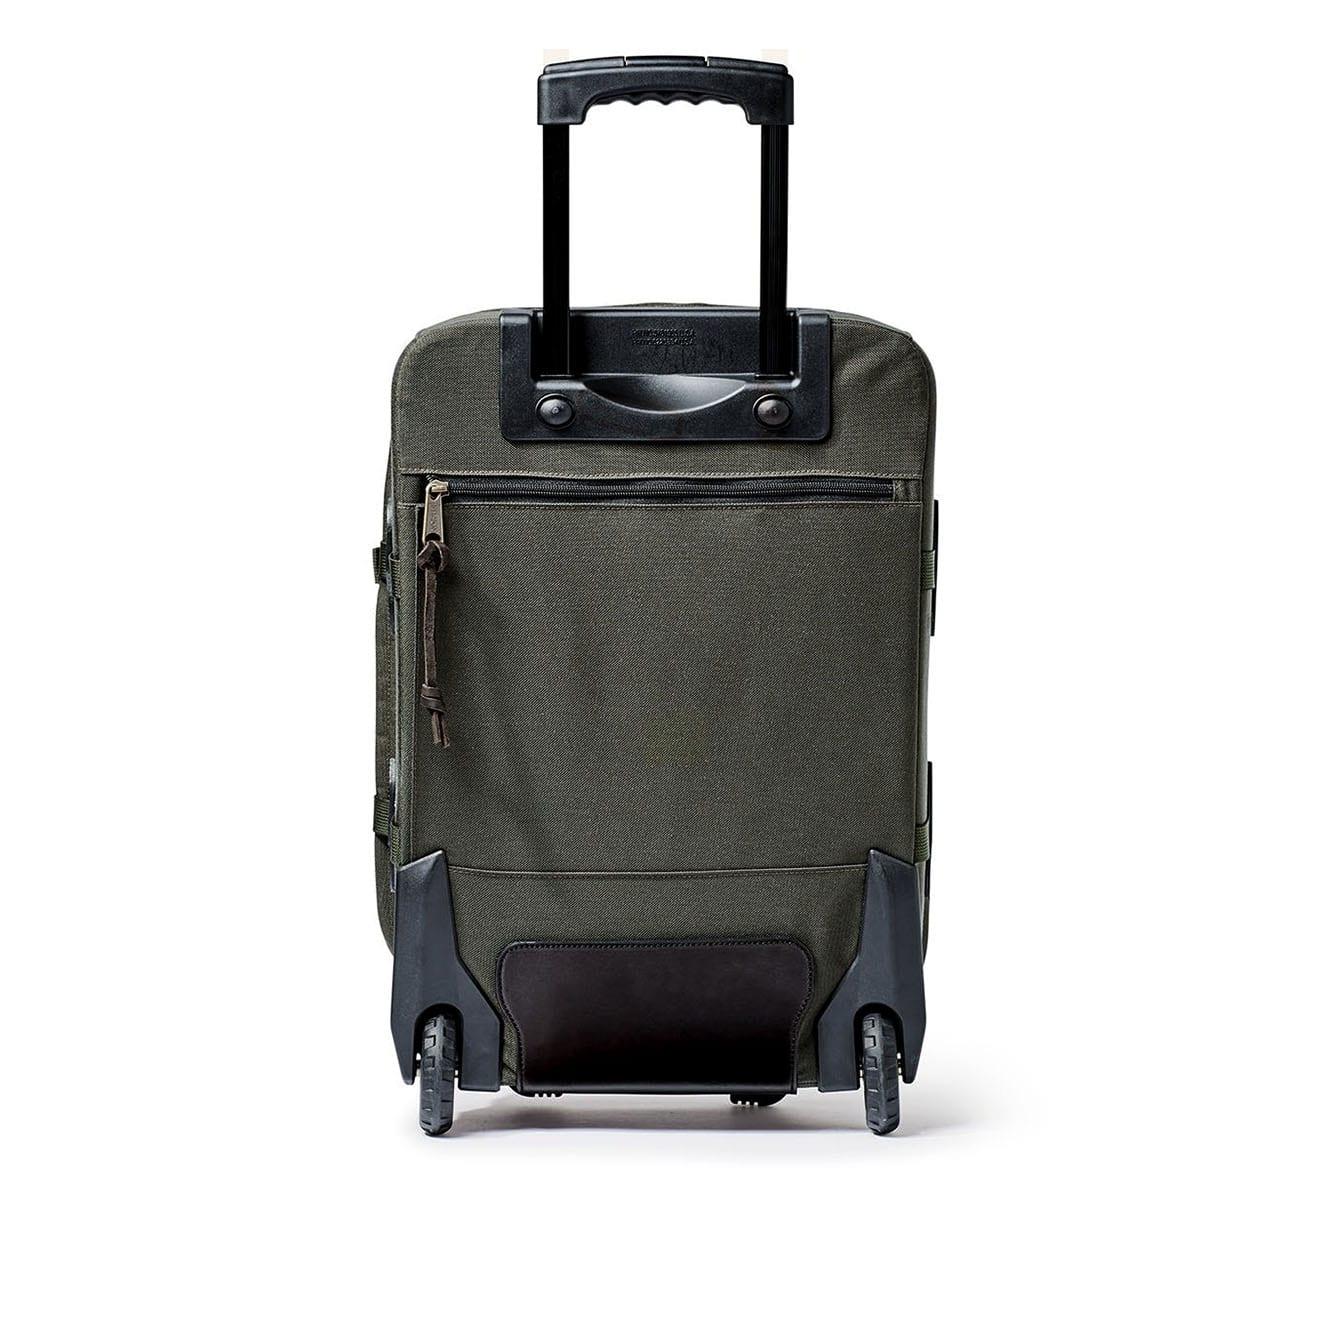 BANK HOLIDAY SALE Filson Dryden 2-Wheel Carry-On Bag Otter Green